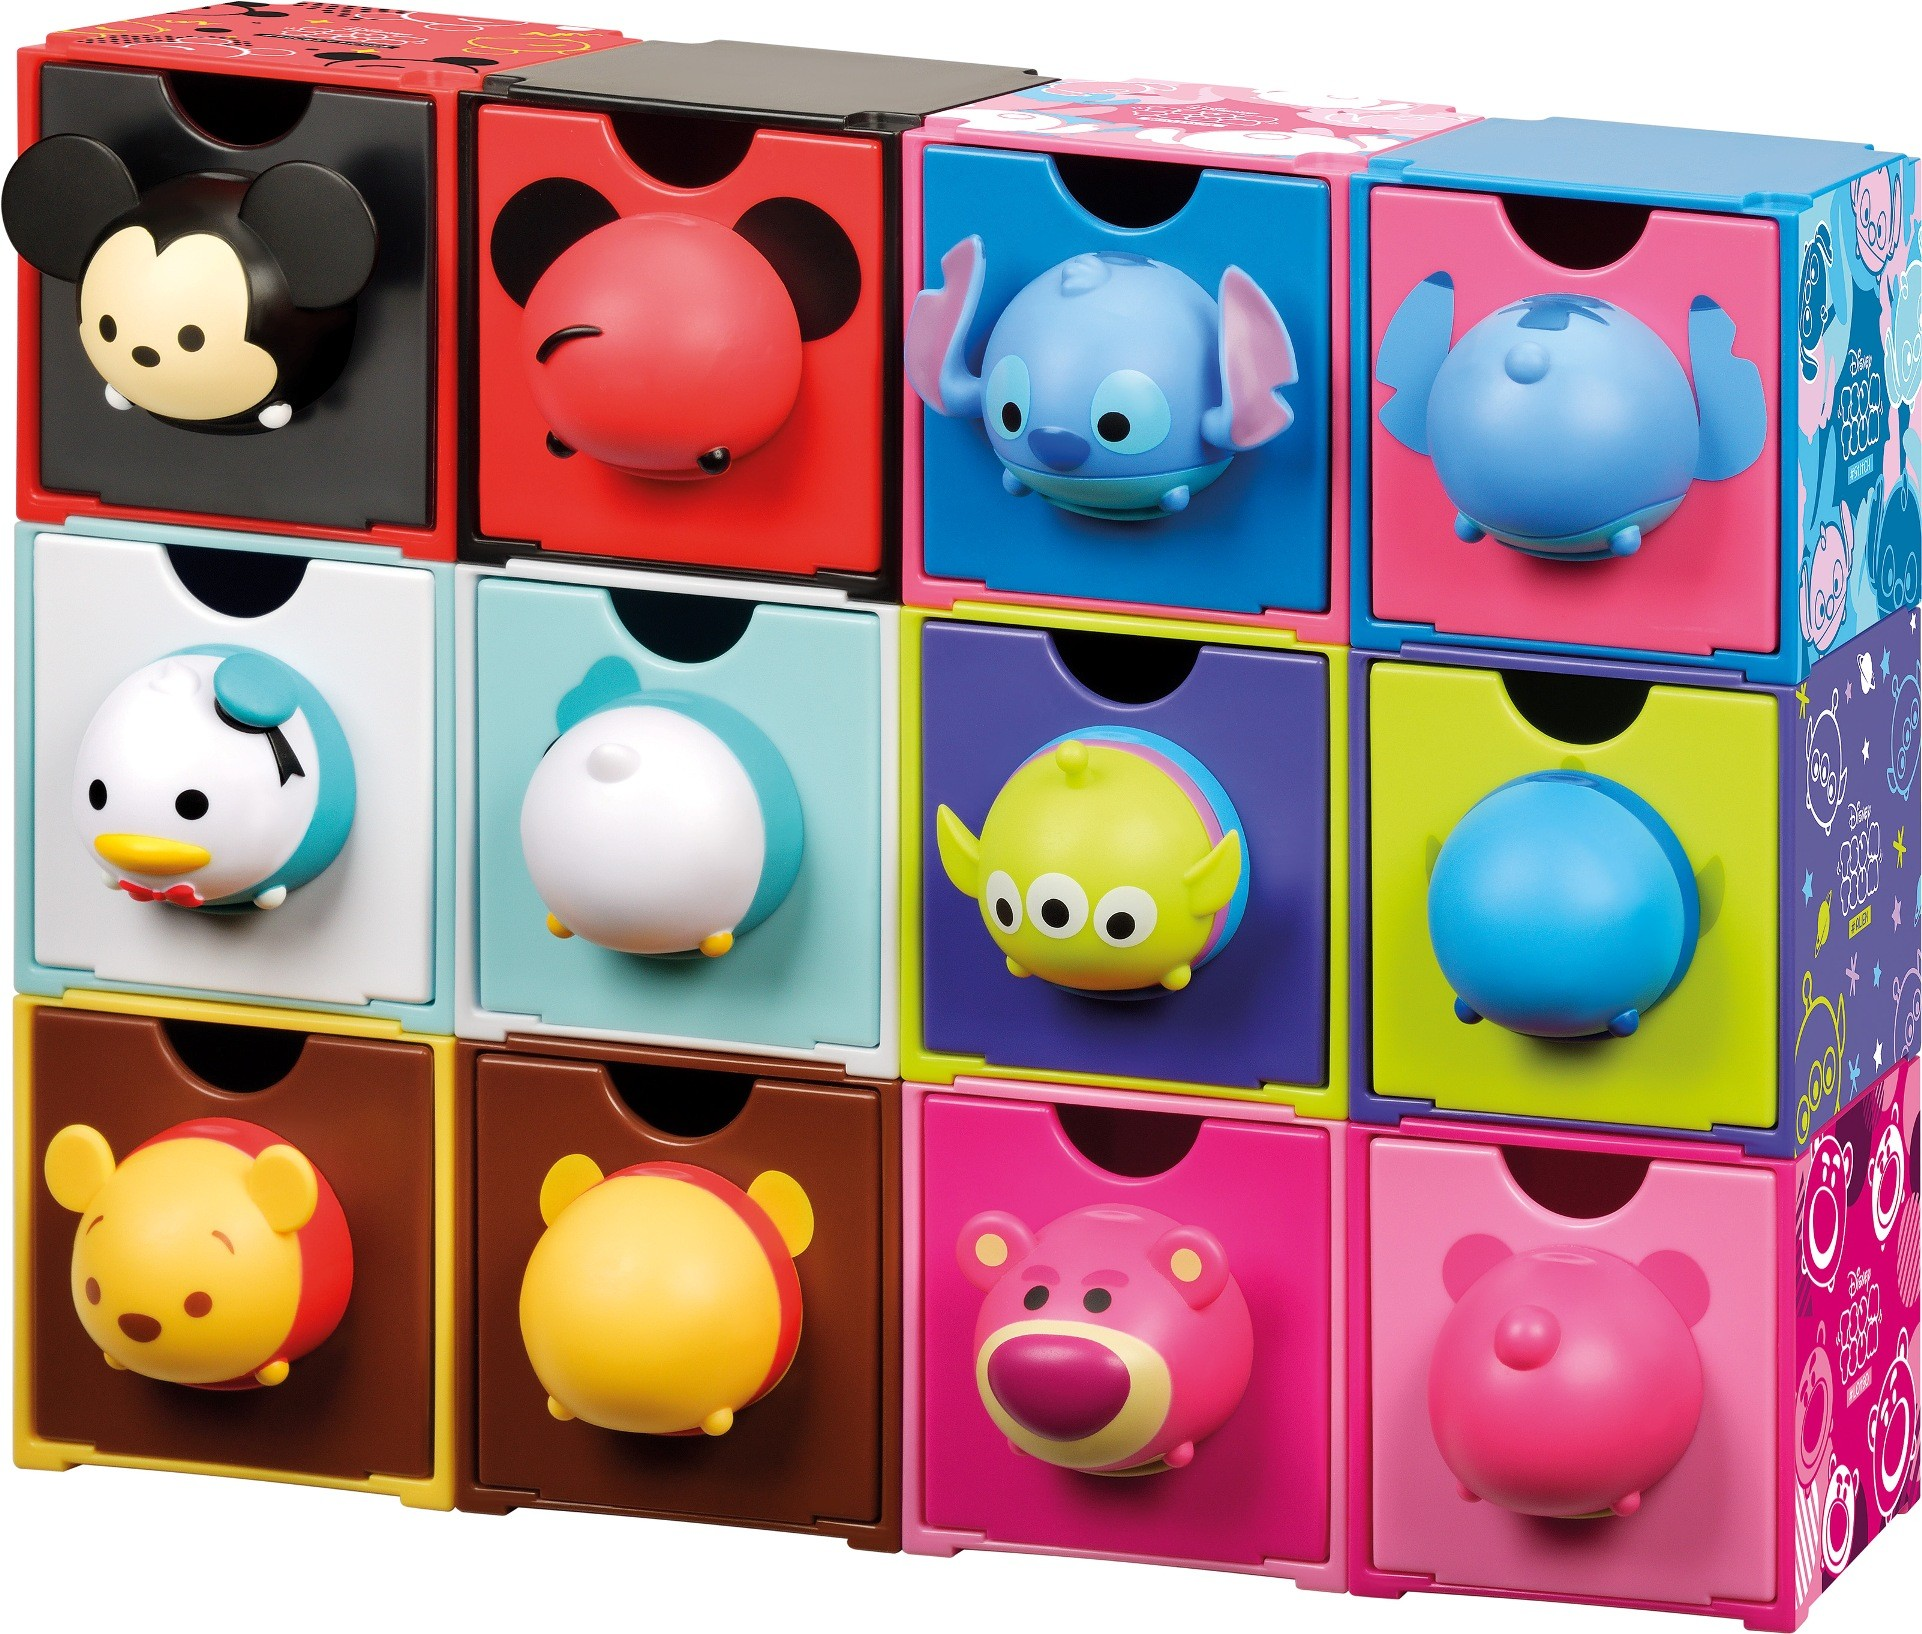 超萌氣爆發    7-Eleven 推出 Disney Tsum Tsum 百變組合 BOX 換購